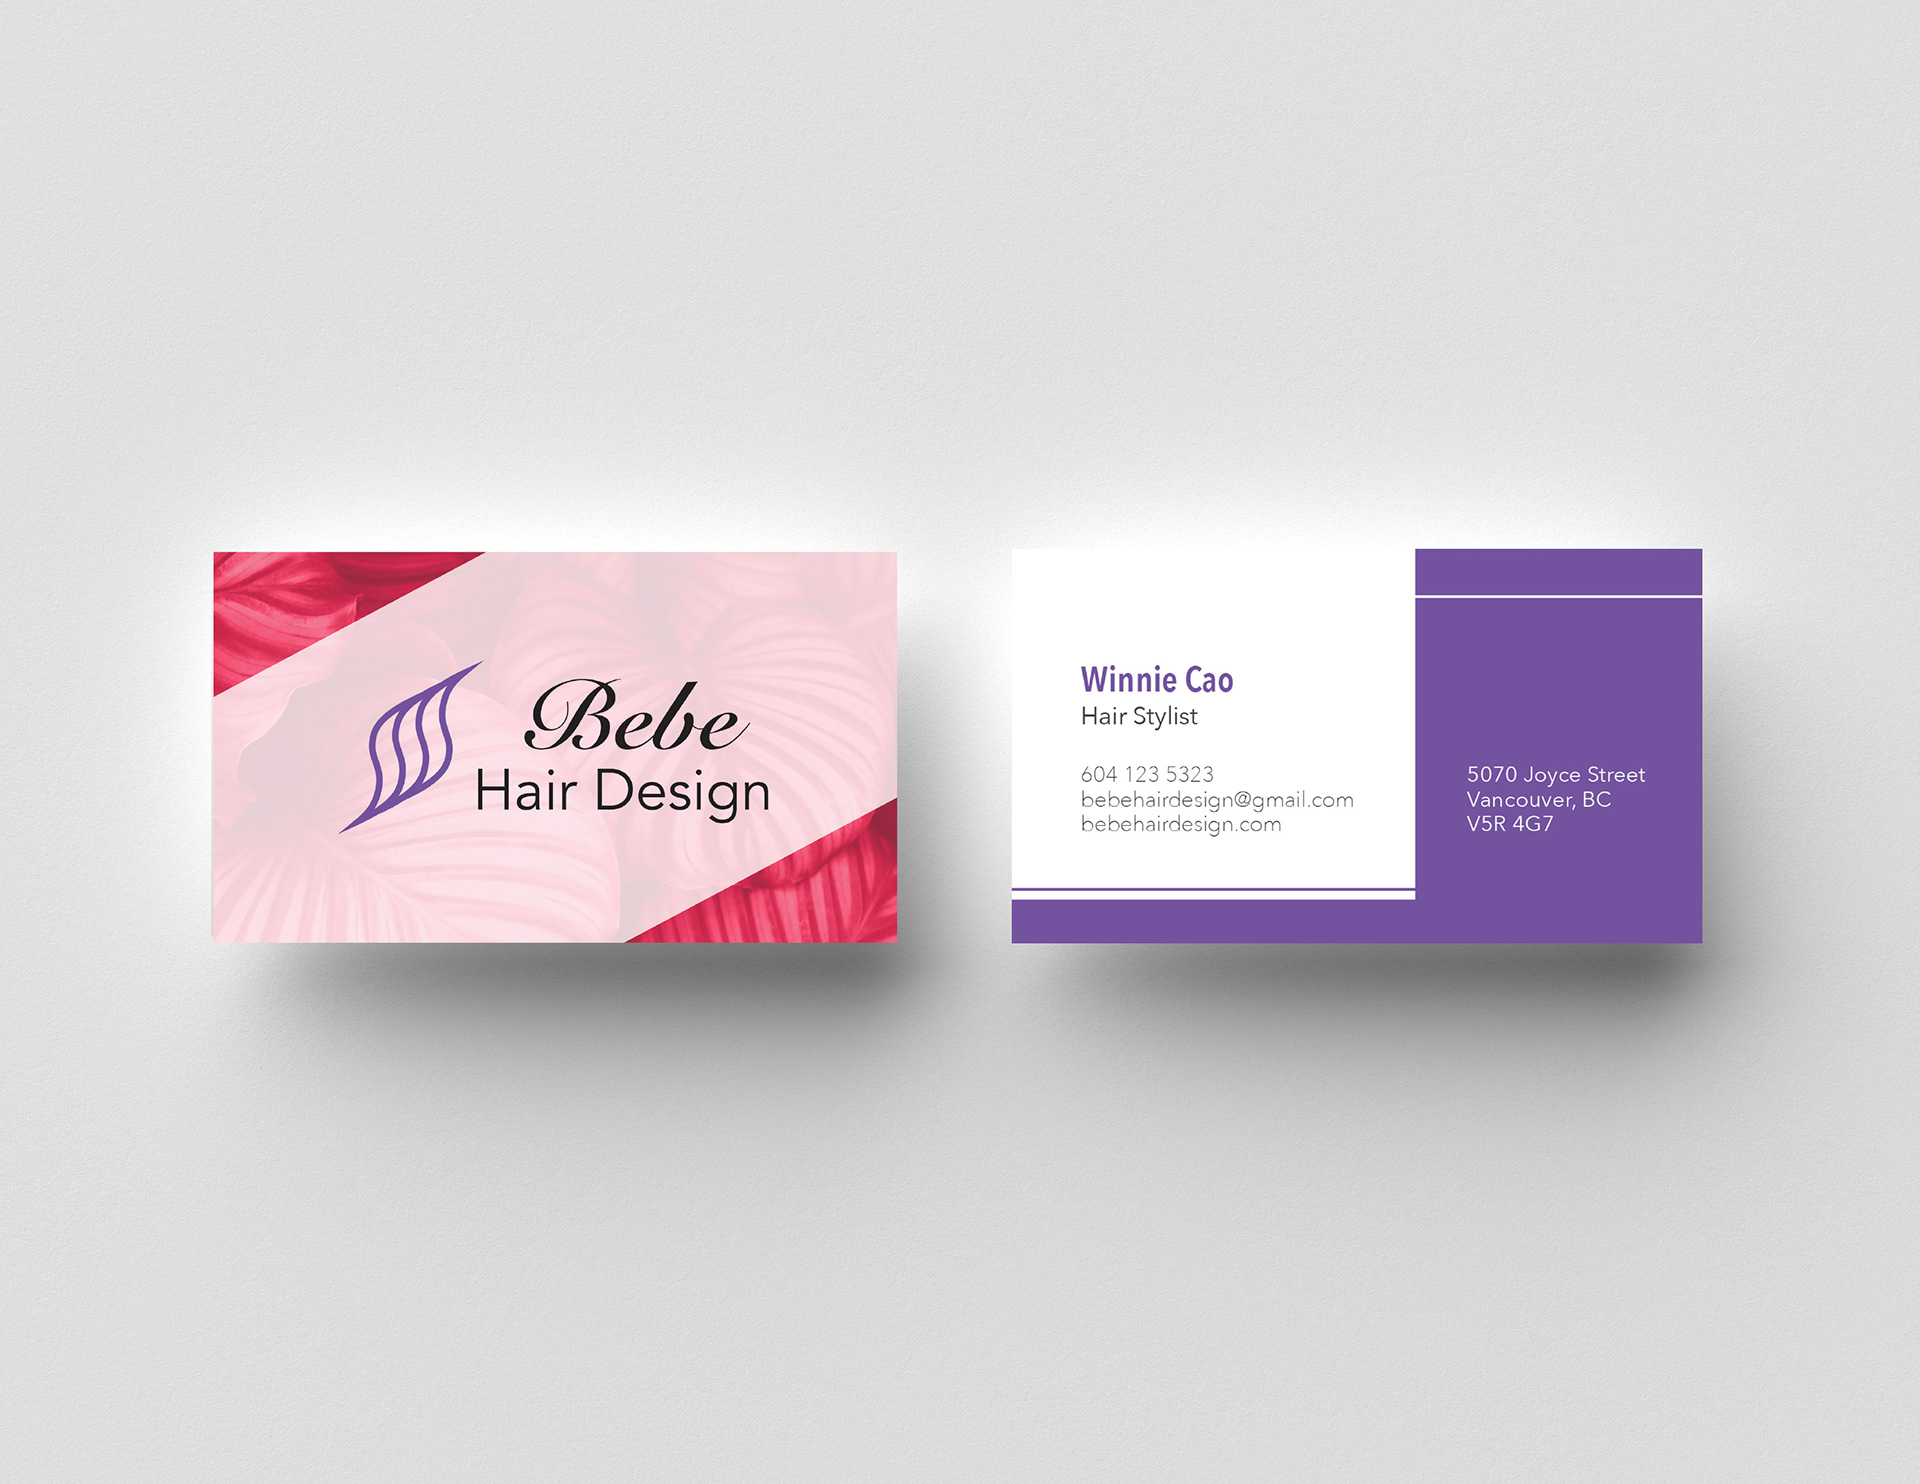 Design Bebe aaron j. mangoba - bebe hair design